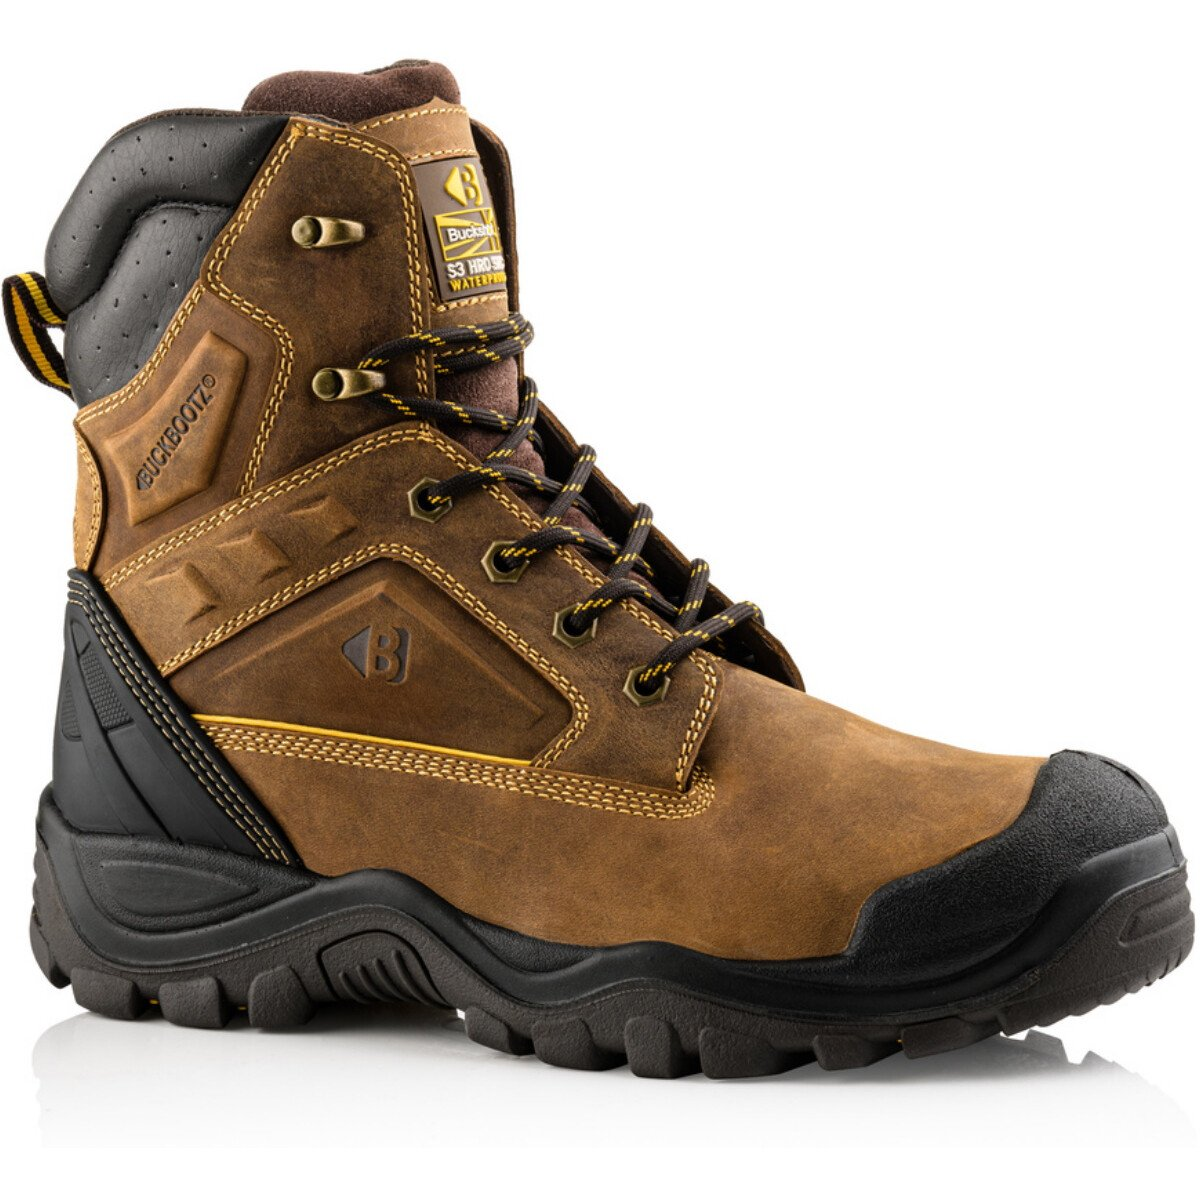 Buckbootz BSH011BR  High-Leg Safety Lace Brown Leather Boot  S3 HRO WRU SRC